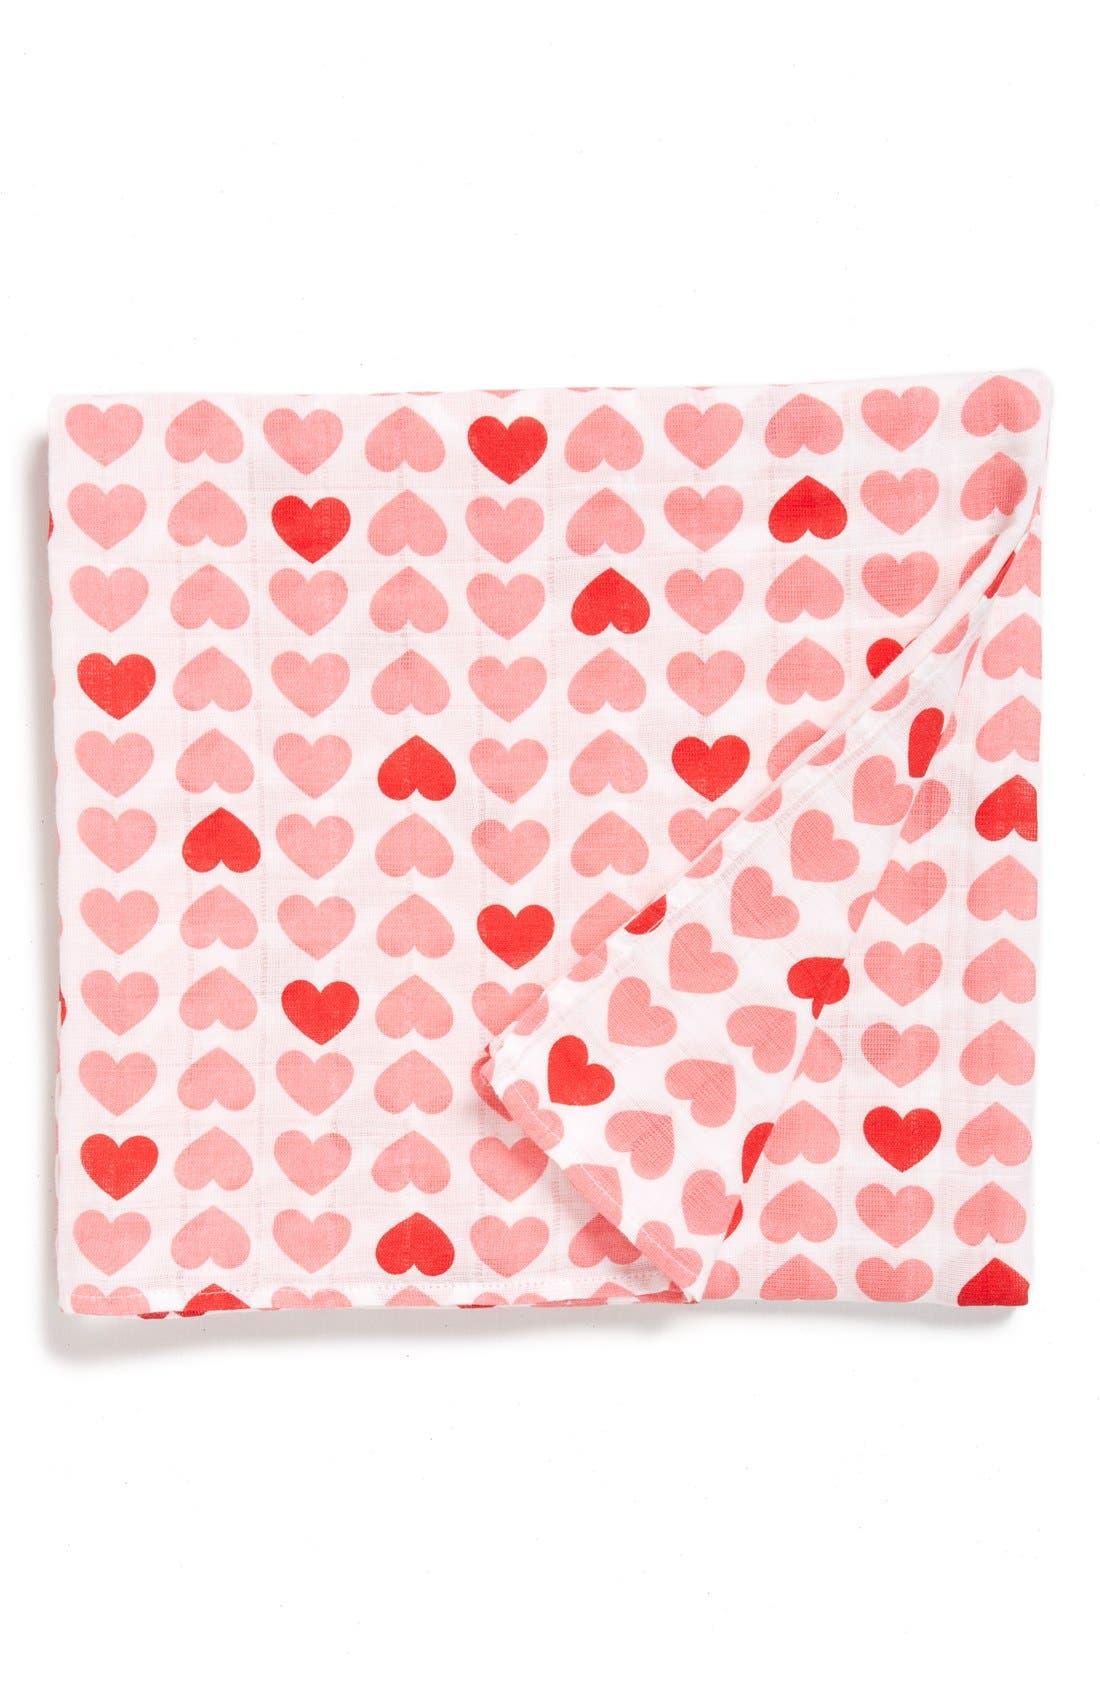 Cotton Swaddle Blanket,                             Main thumbnail 20, color,